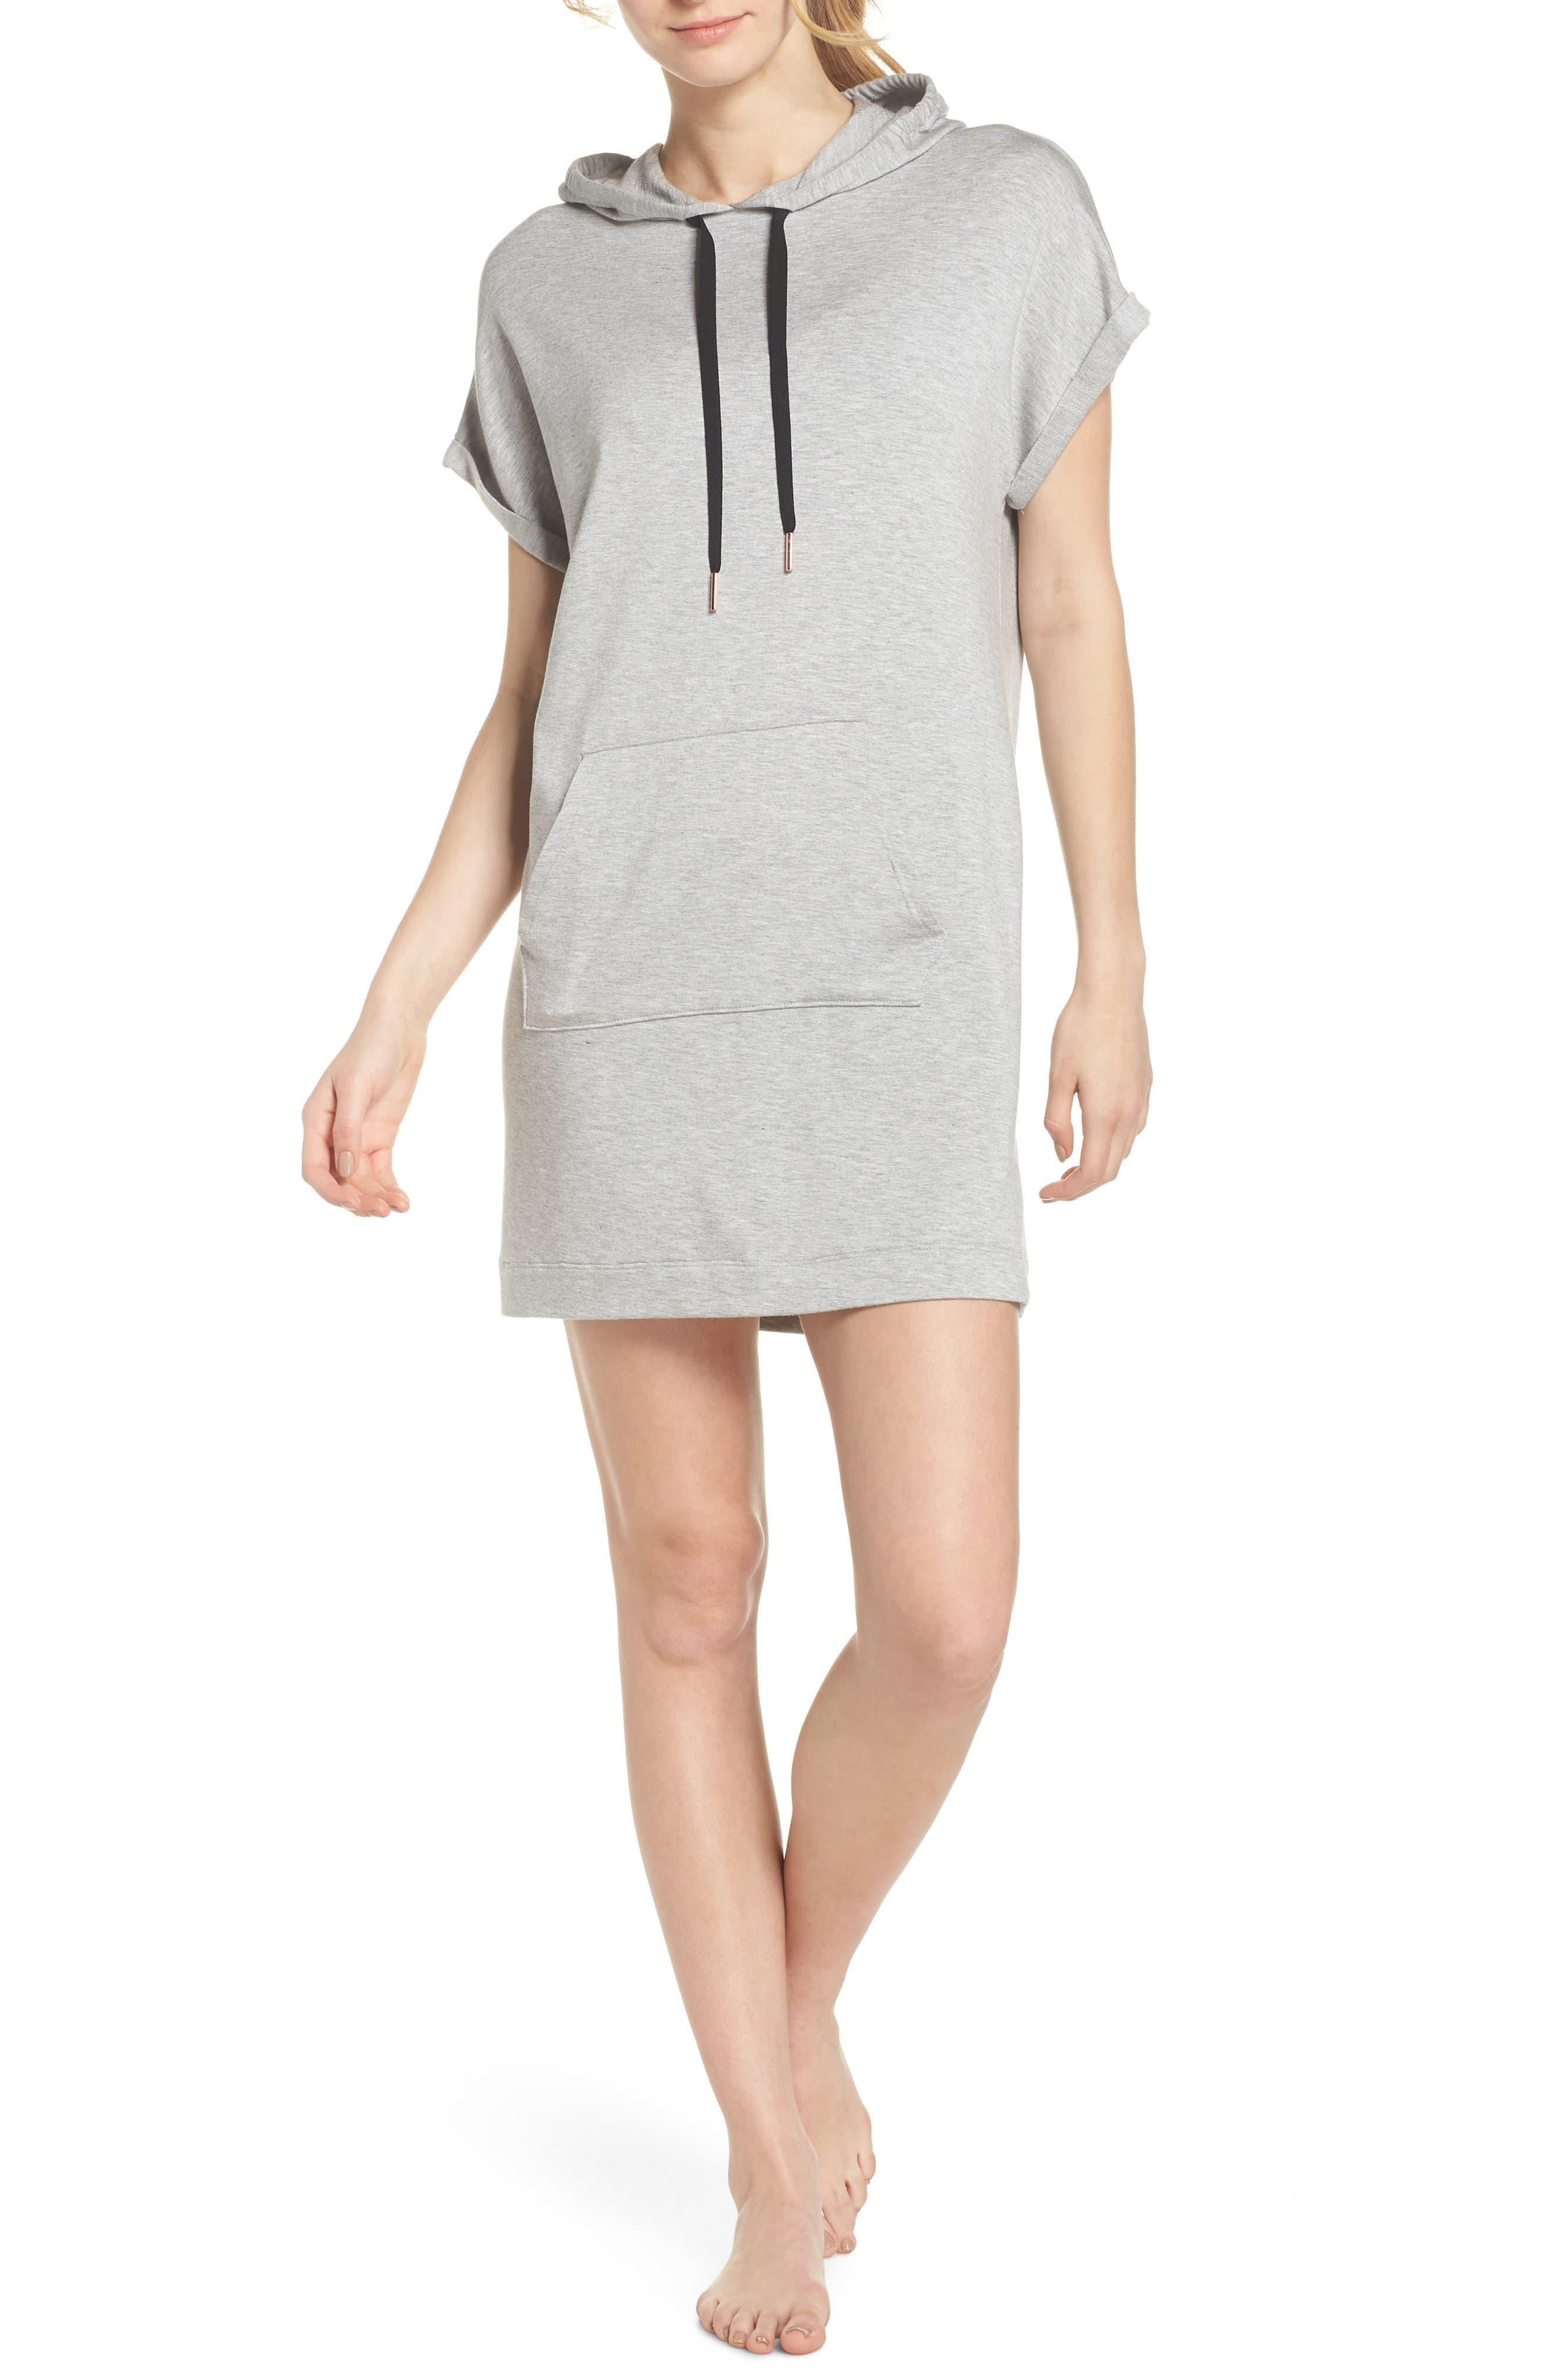 It's All Hoodie Hooded Sweatshirt Dress,                         Main,                         color, LIGHT HEATHER GRAY